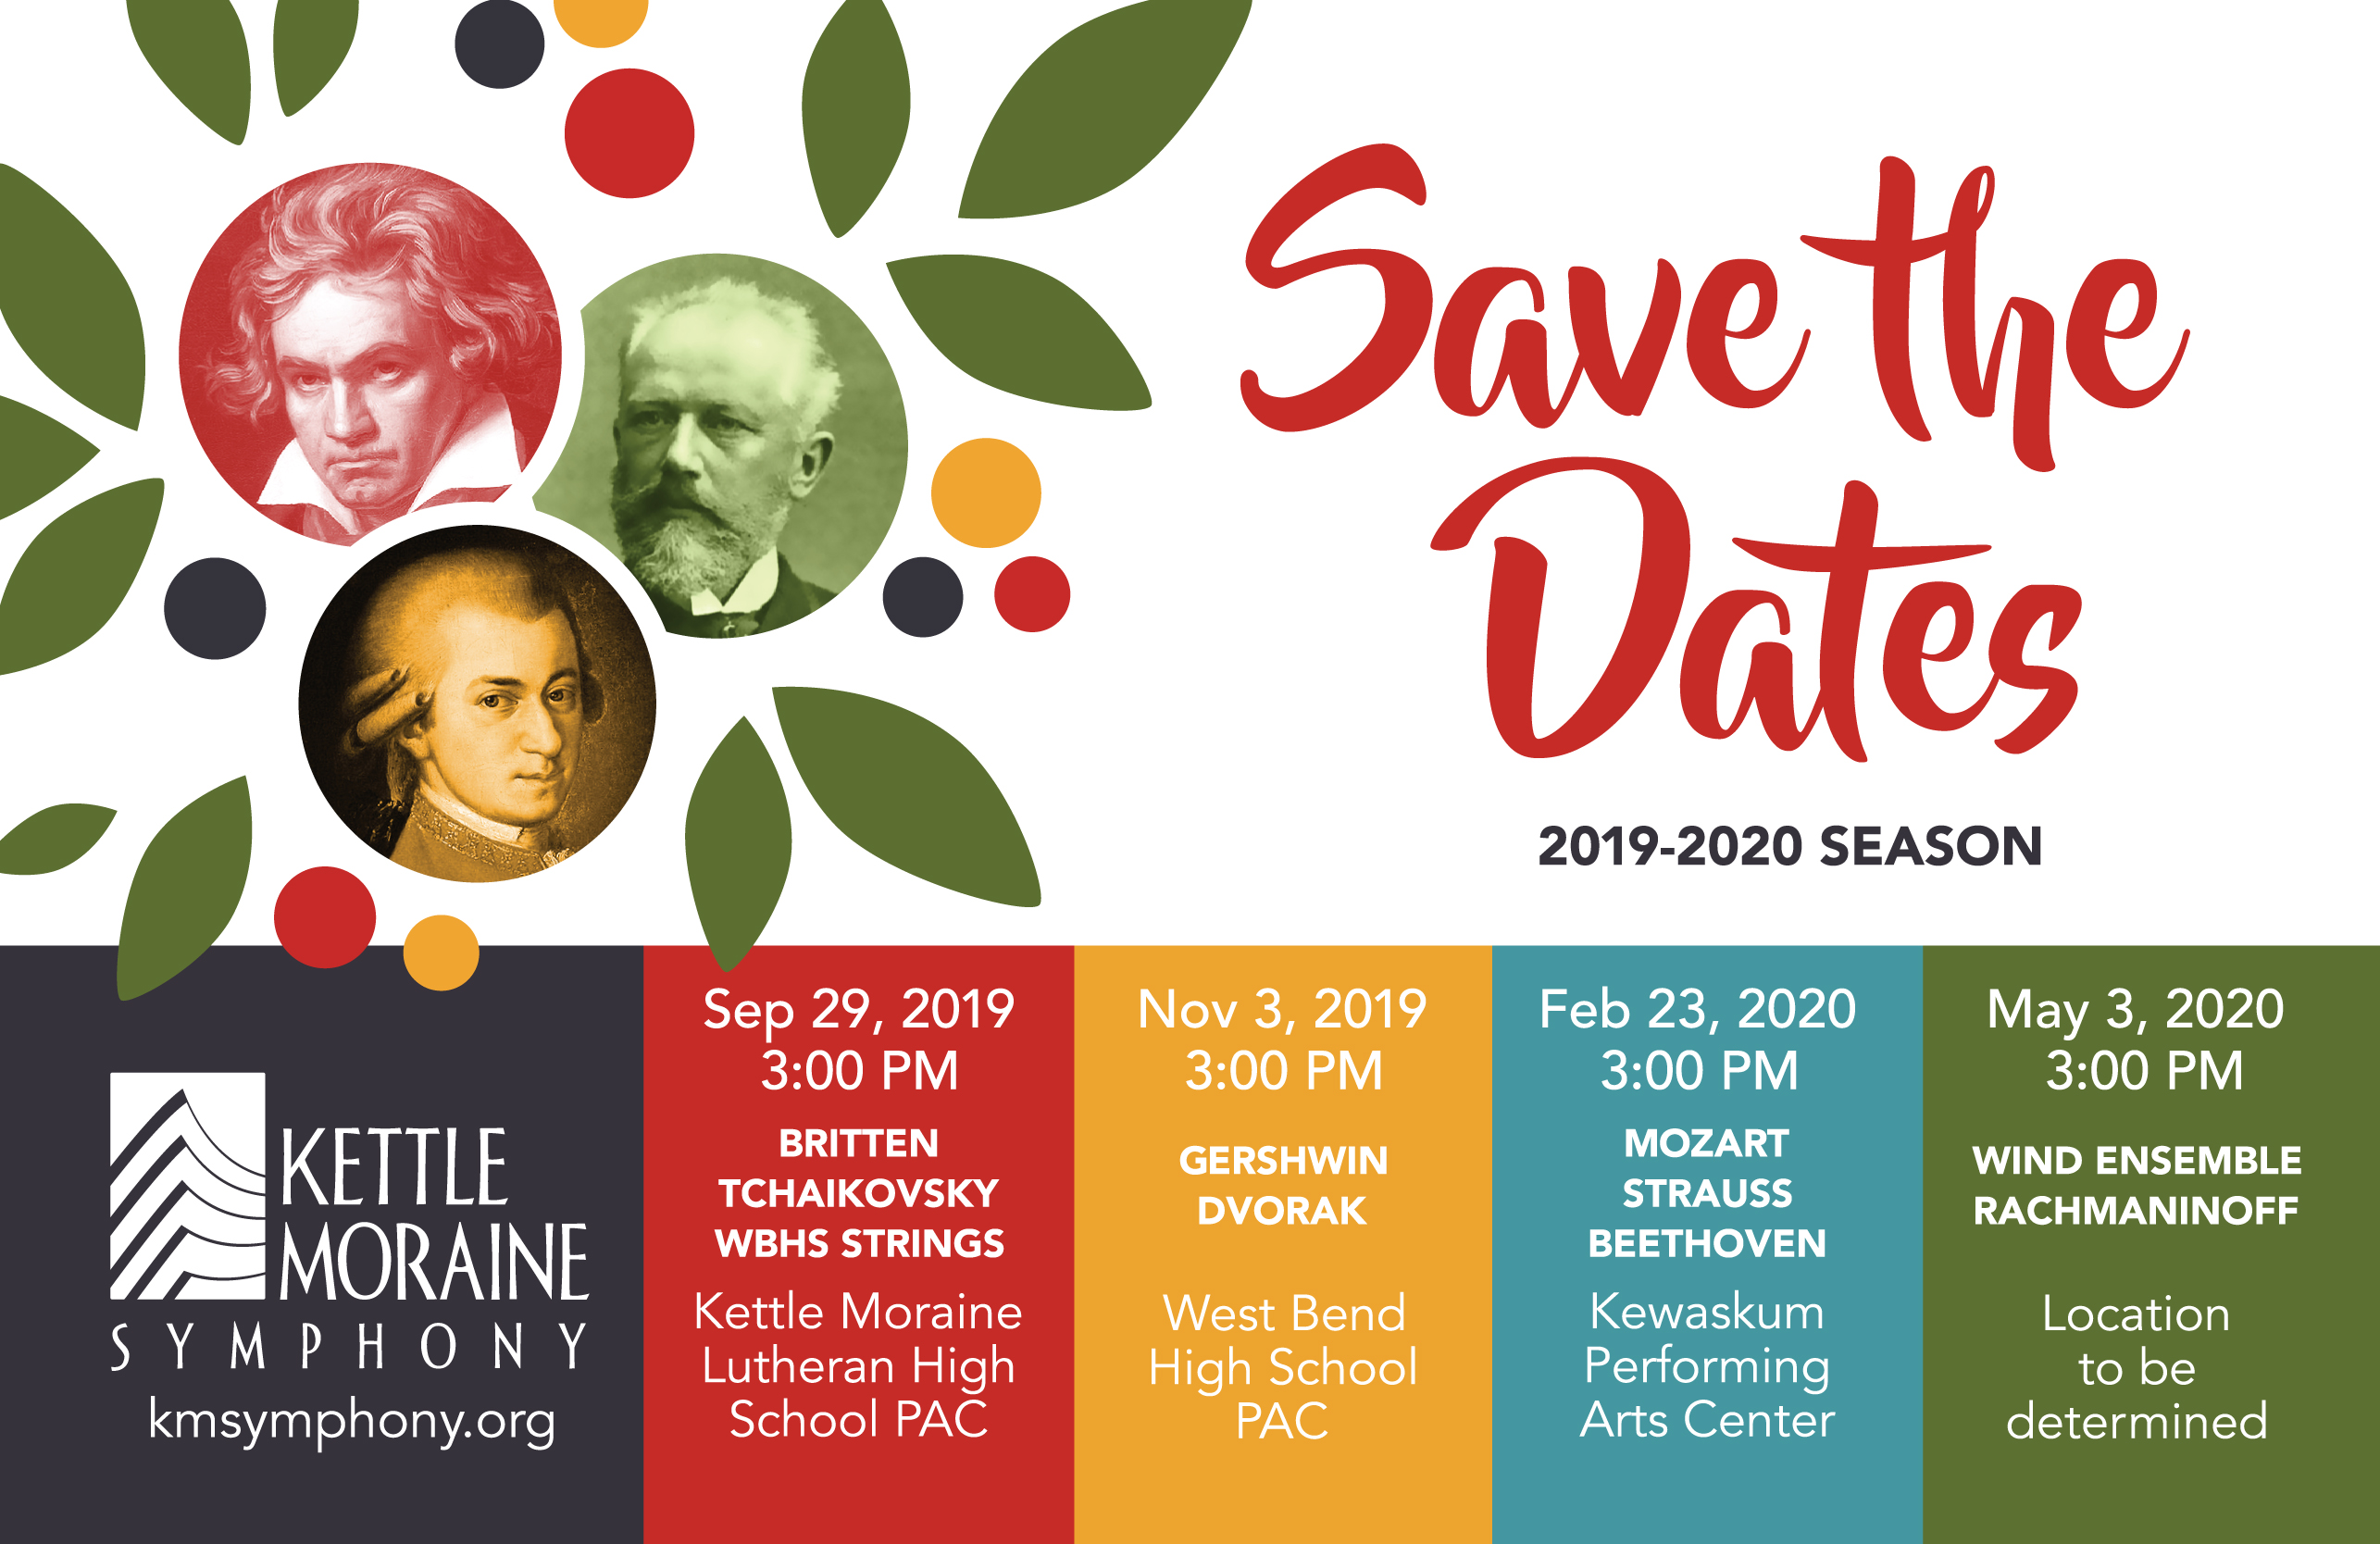 Lutheran Calendar Holy Days February 2020 Kettle Moraine Symphony – Premier symphony orchestra of the